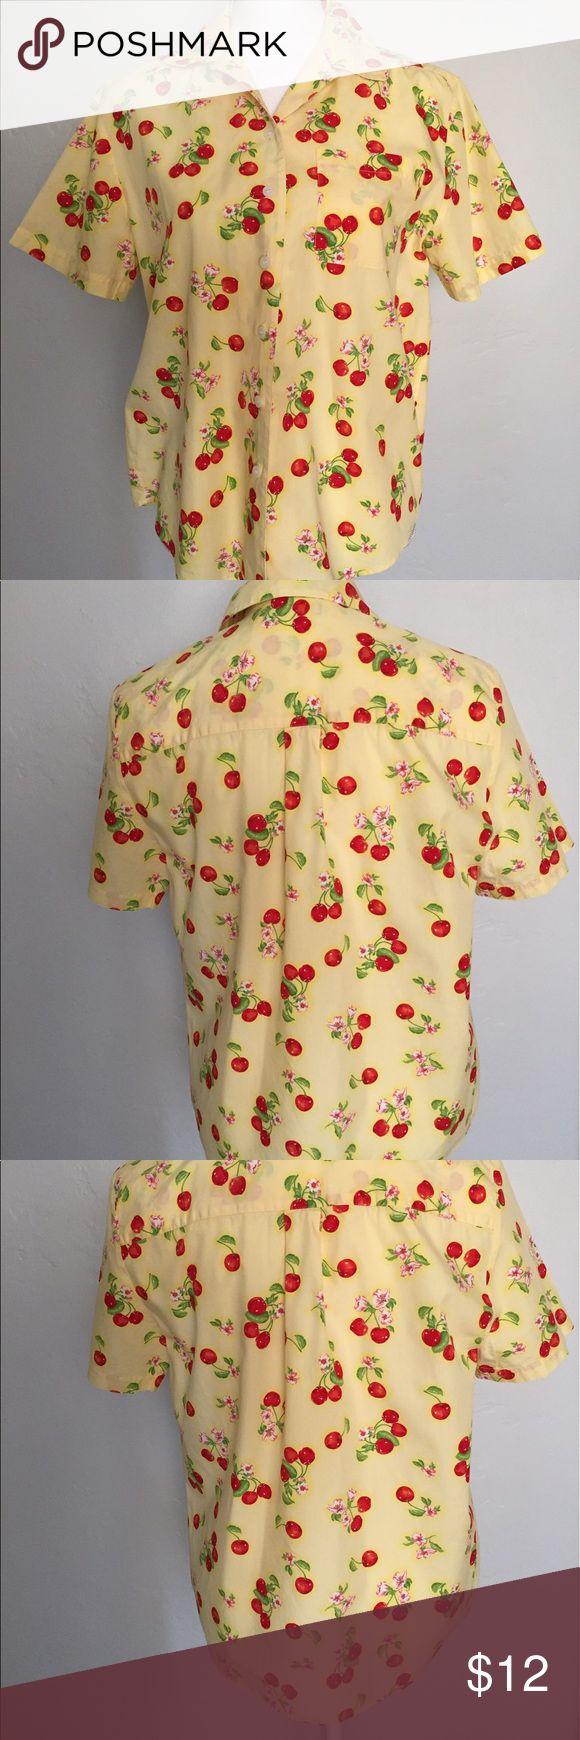 Karen Scott Sport Cherries Shirt, size S 100% cotton light weight Cherries print. Very good preowned condition. Karen Scott Tops Blouses